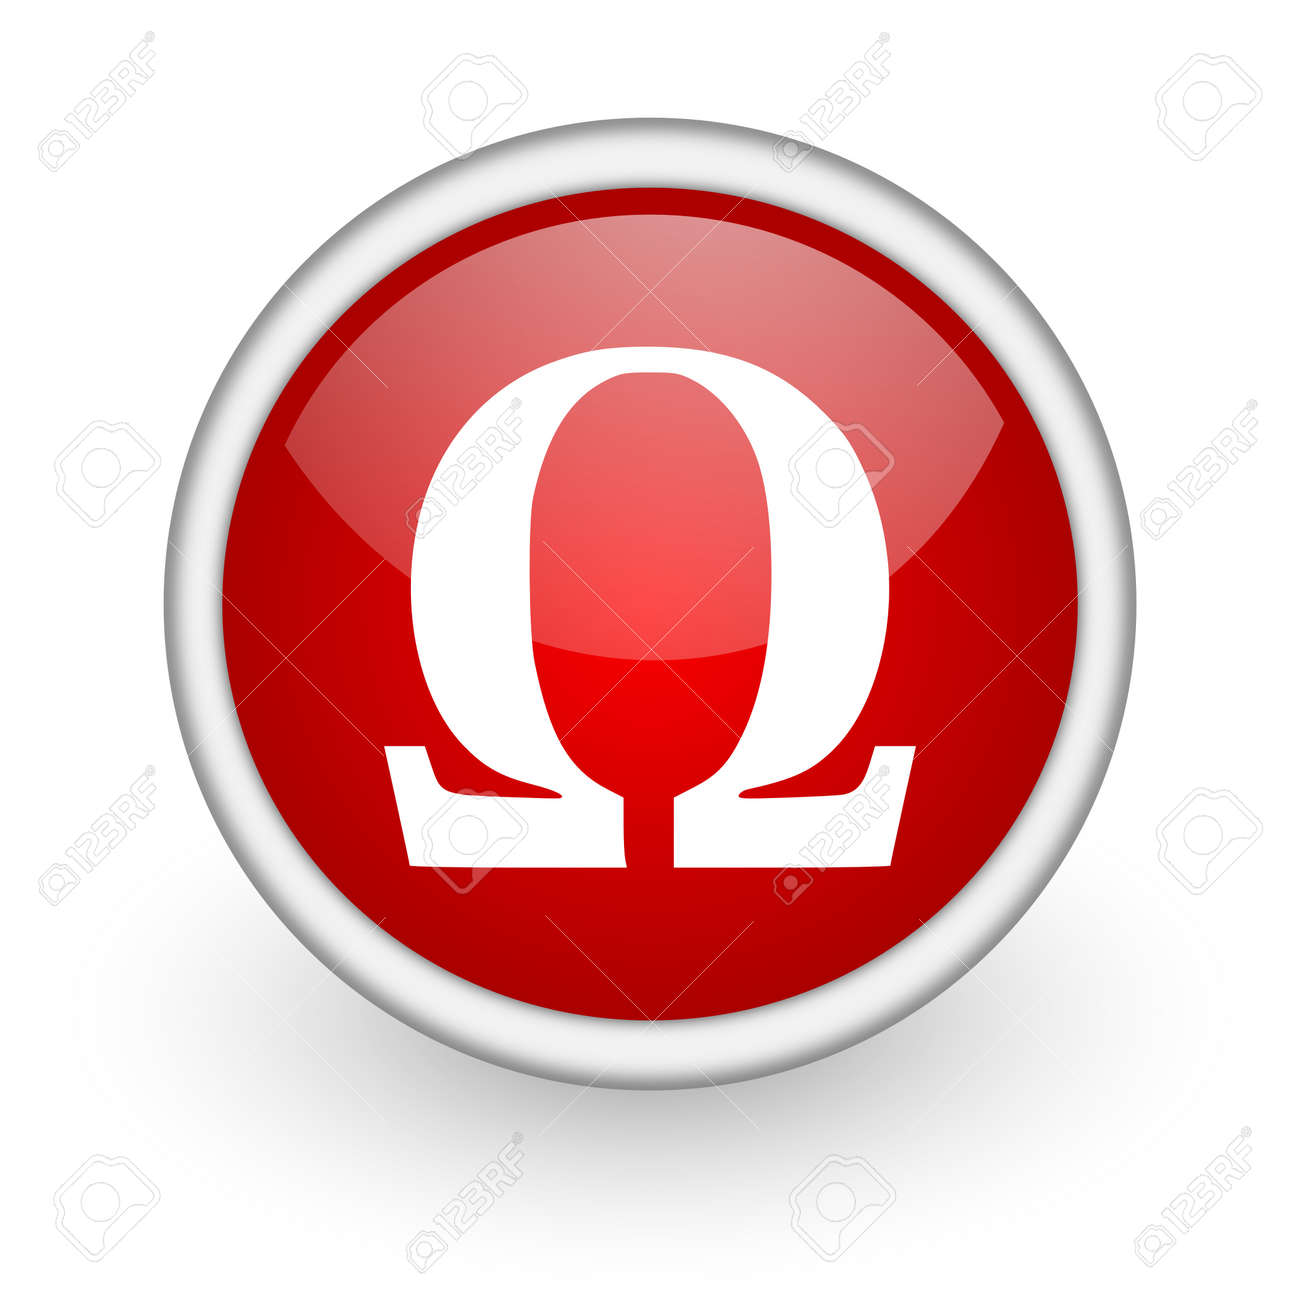 Omega red circle web icon on white background stock photo picture omega red circle web icon on white background stock photo 17518805 buycottarizona